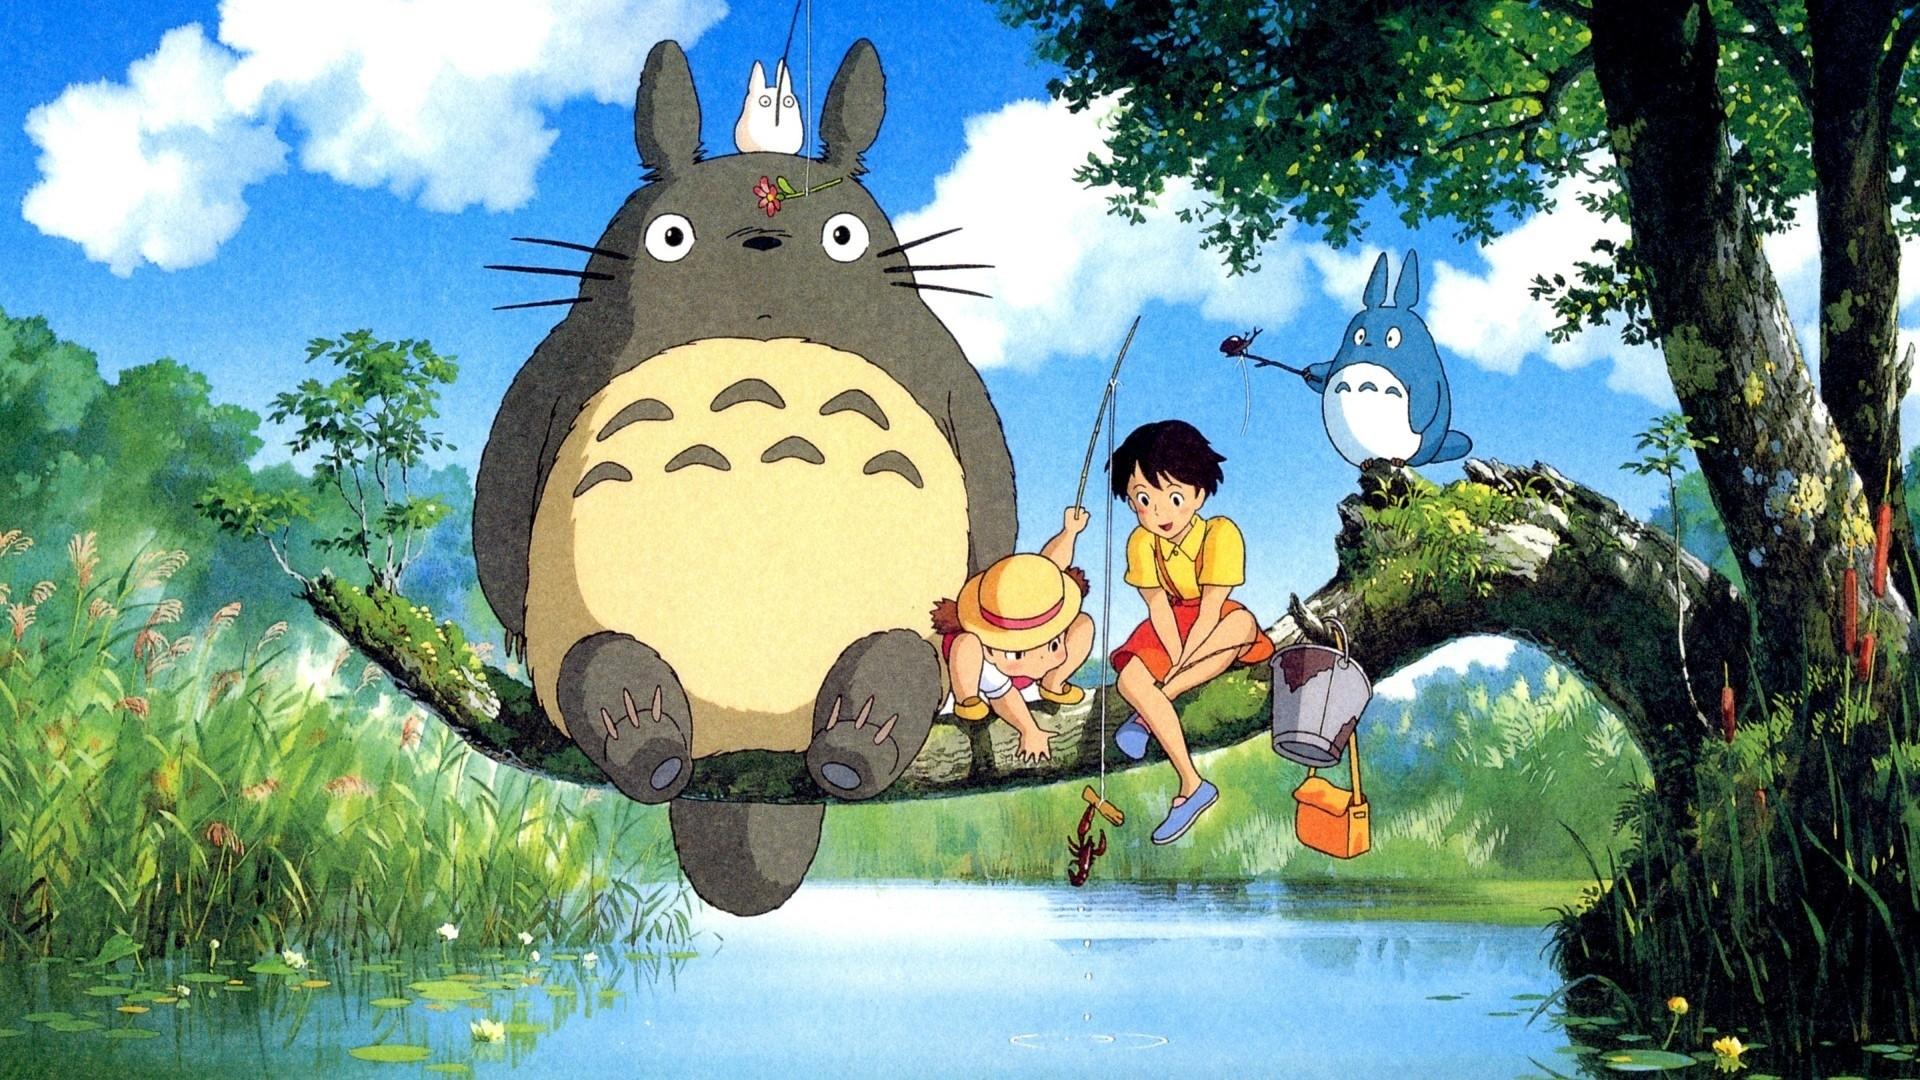 Ghibli wallpaper photo hd